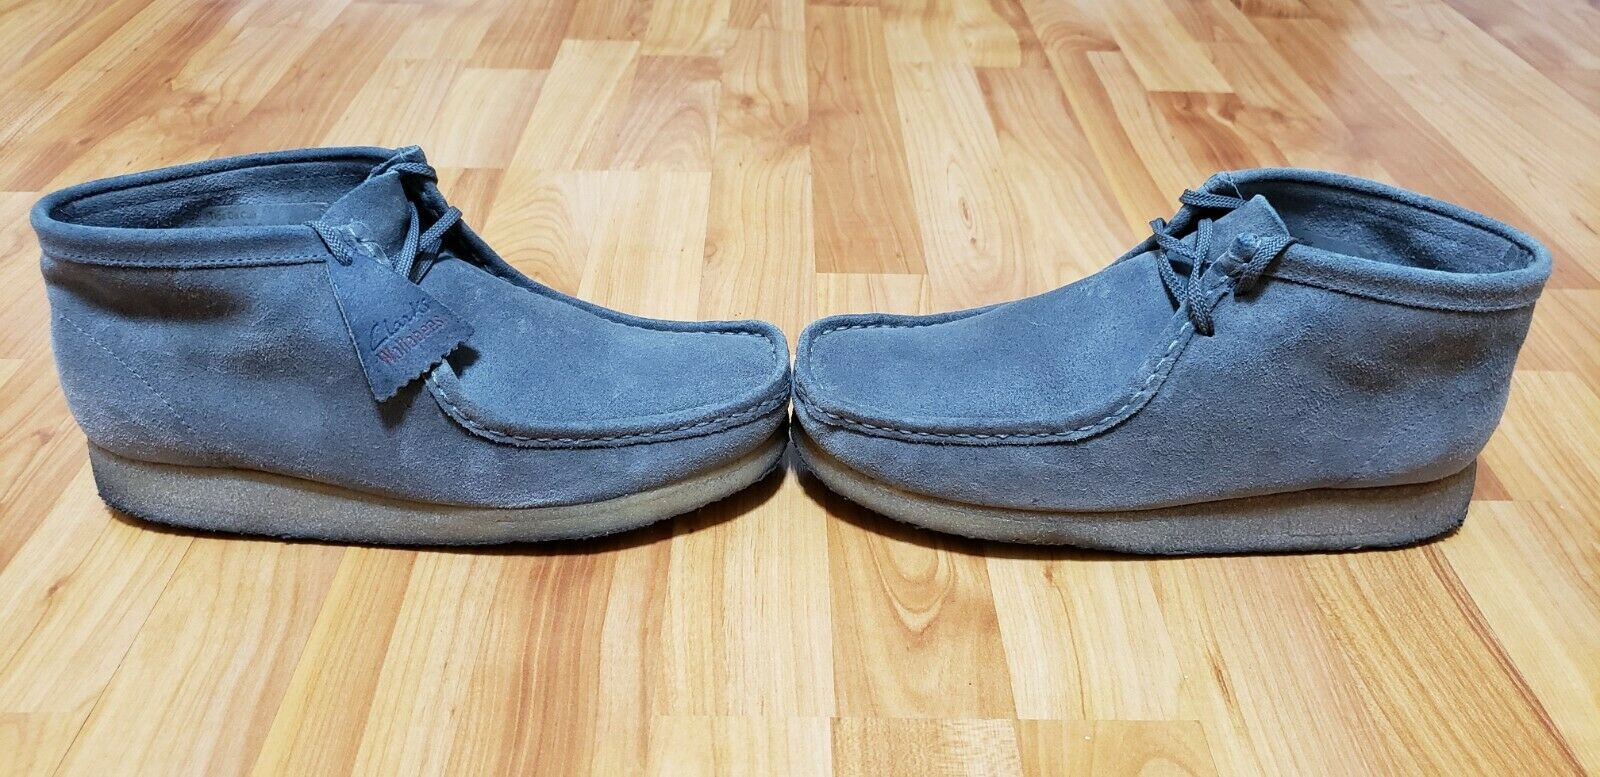 size 14 skate shoes Rudolph Blaze Ingram Posts Facebook